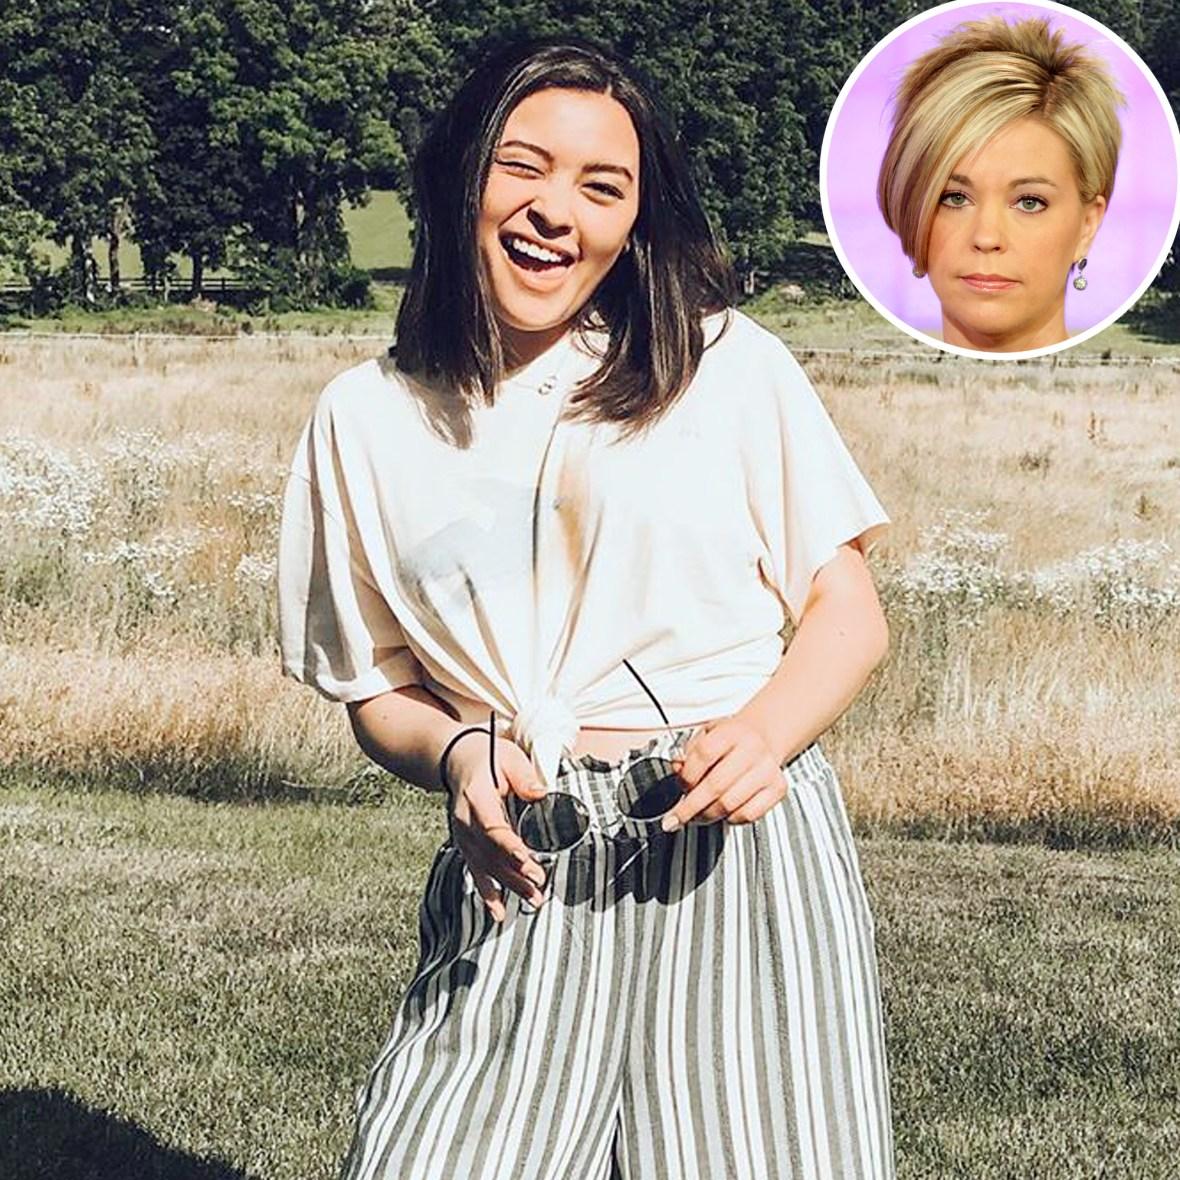 Mady Gosselin Pokes Fun Mom Kate Signature Haircut Reality Show Jon Kate Plus 8